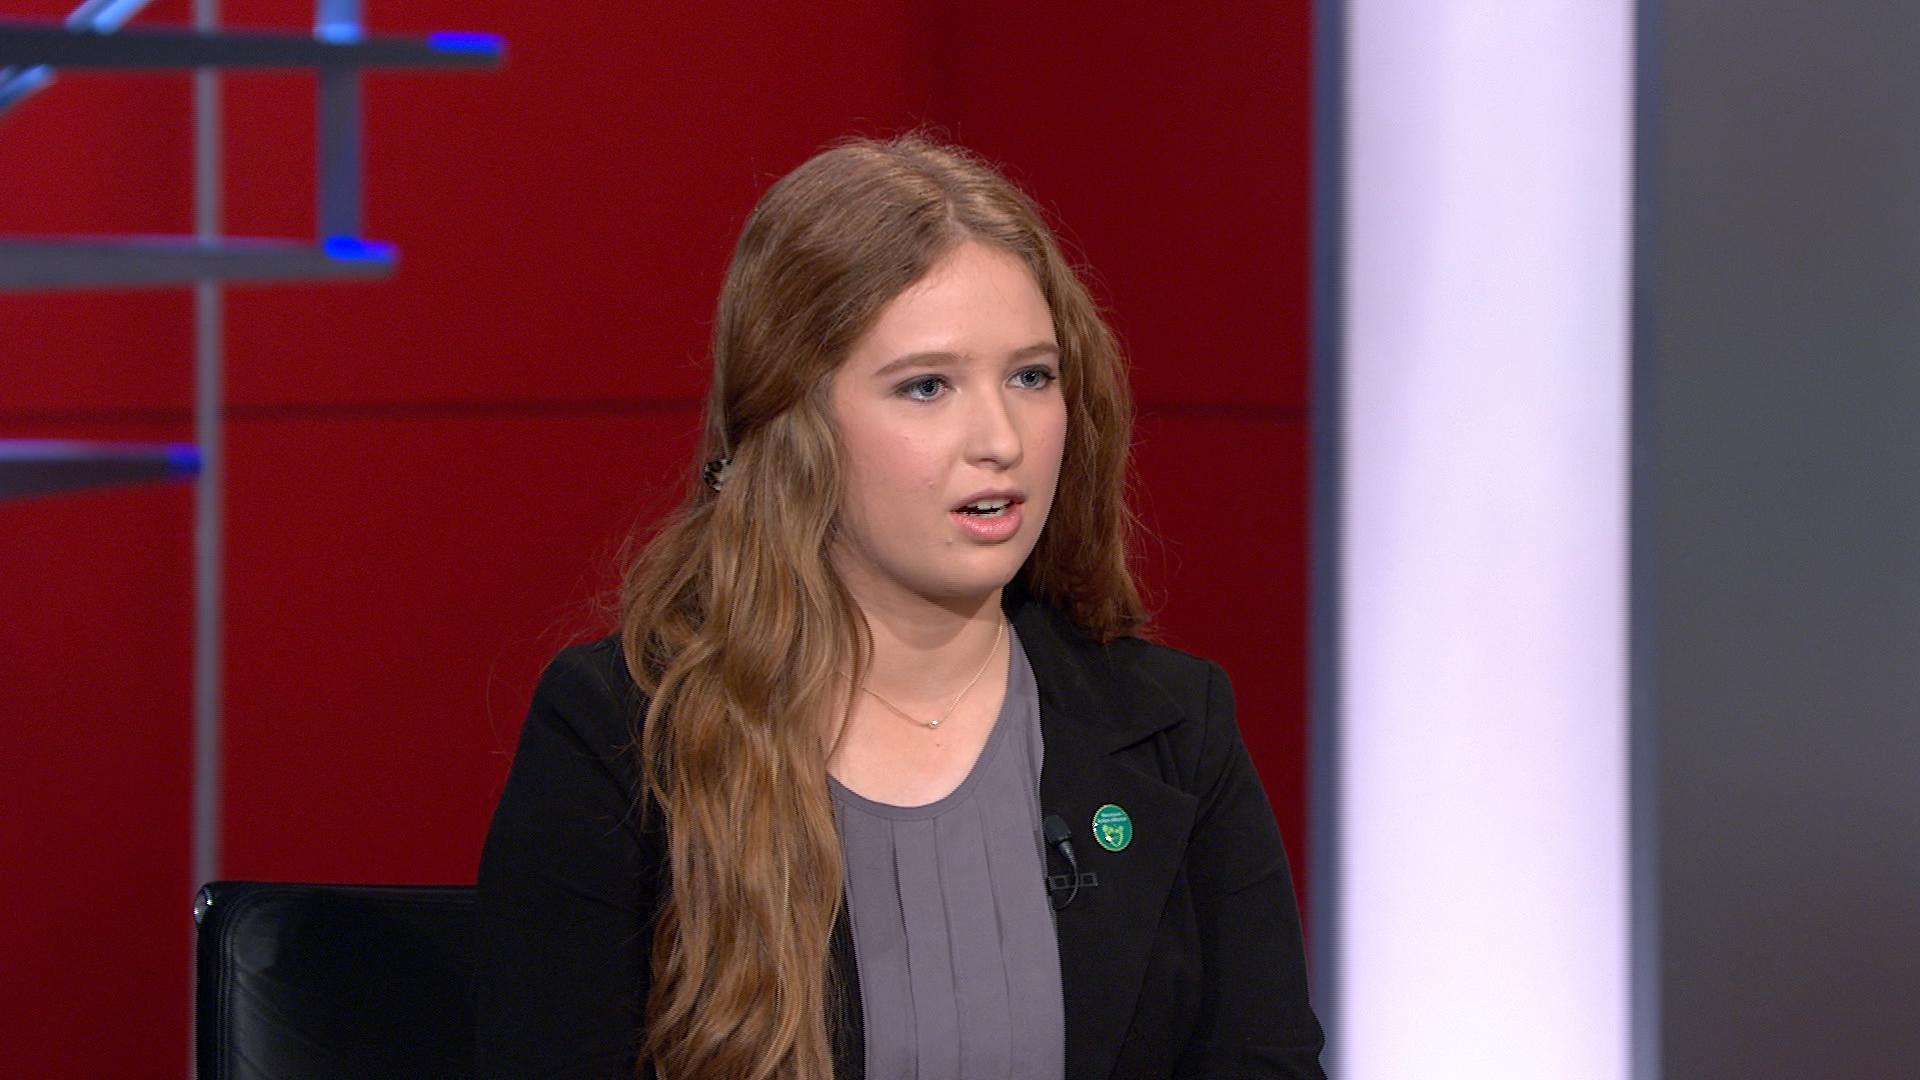 Newtown teen leads gun-safety youth movement